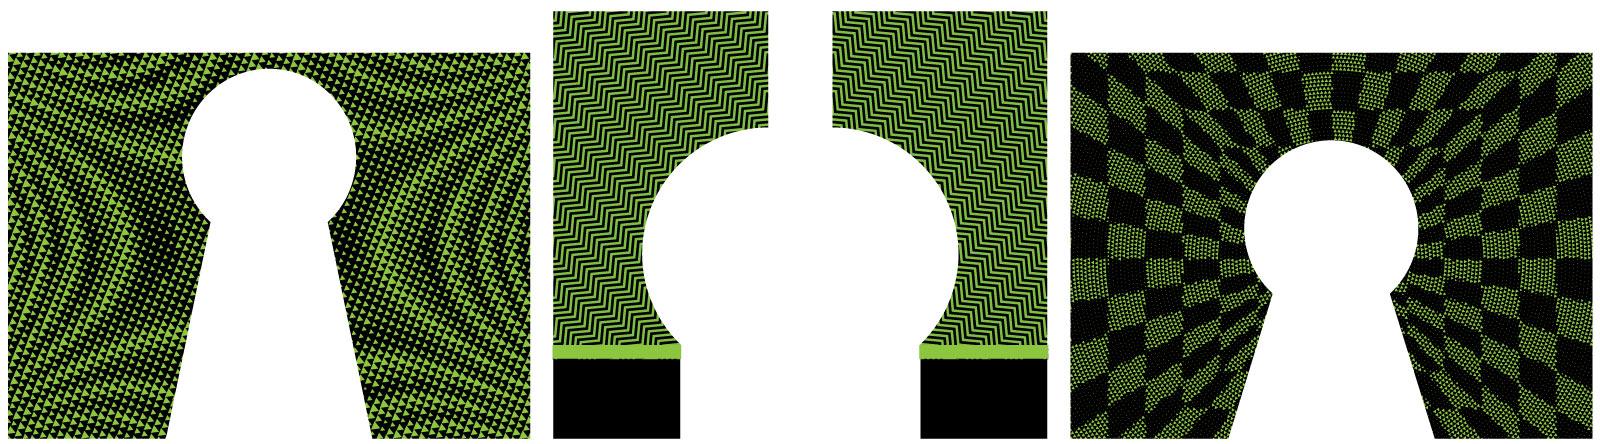 18-gtc-party-key-hole-tunnel-entrances-patterns-r1-ol.jpg